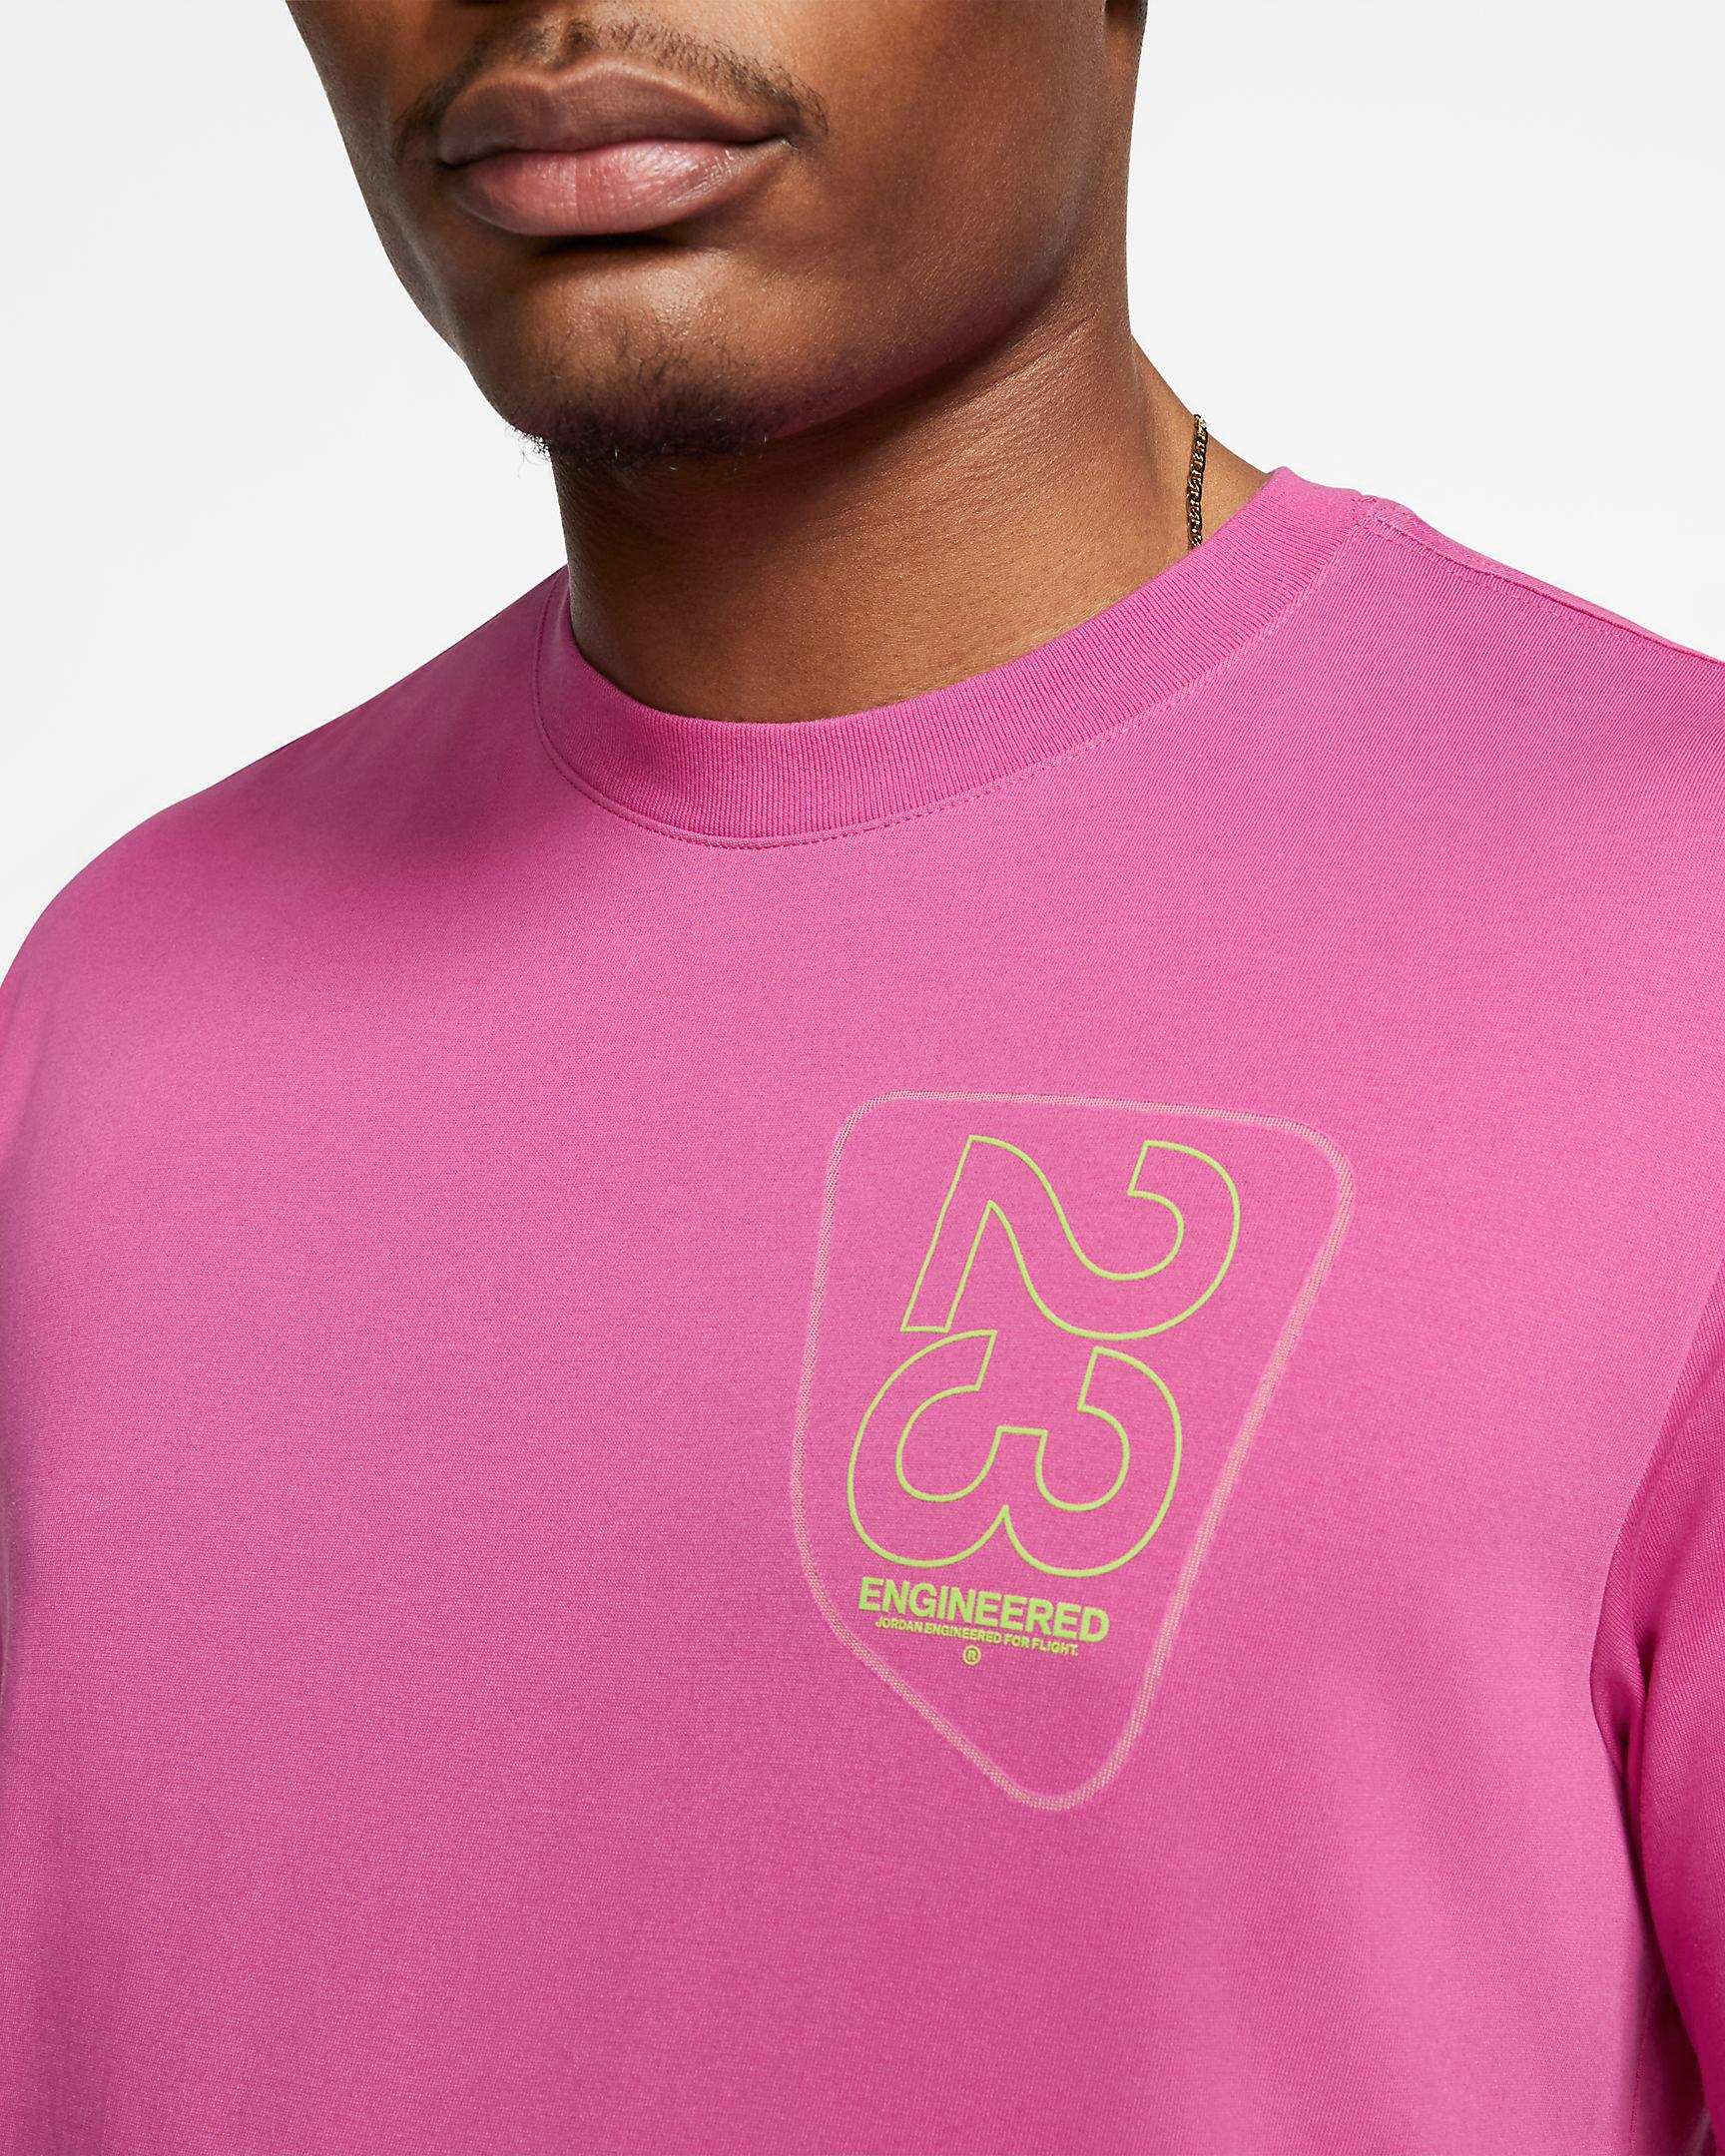 jordan-23-engineered-active-fuchsia-shirt-3